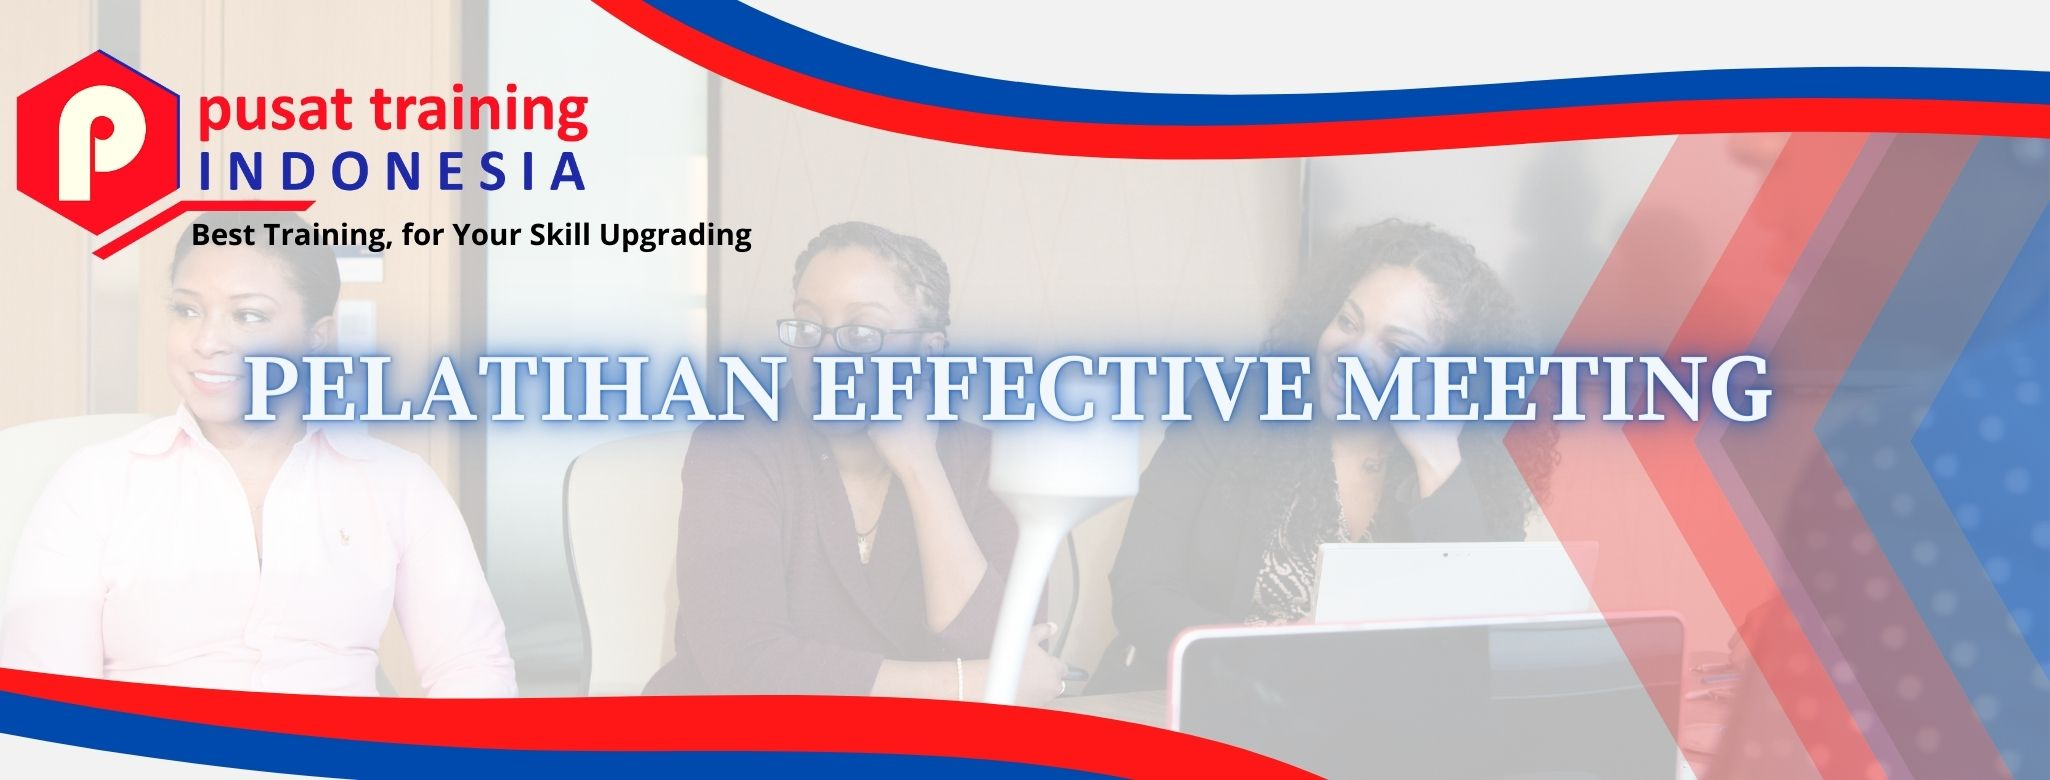 pelatihan-effective-meeting